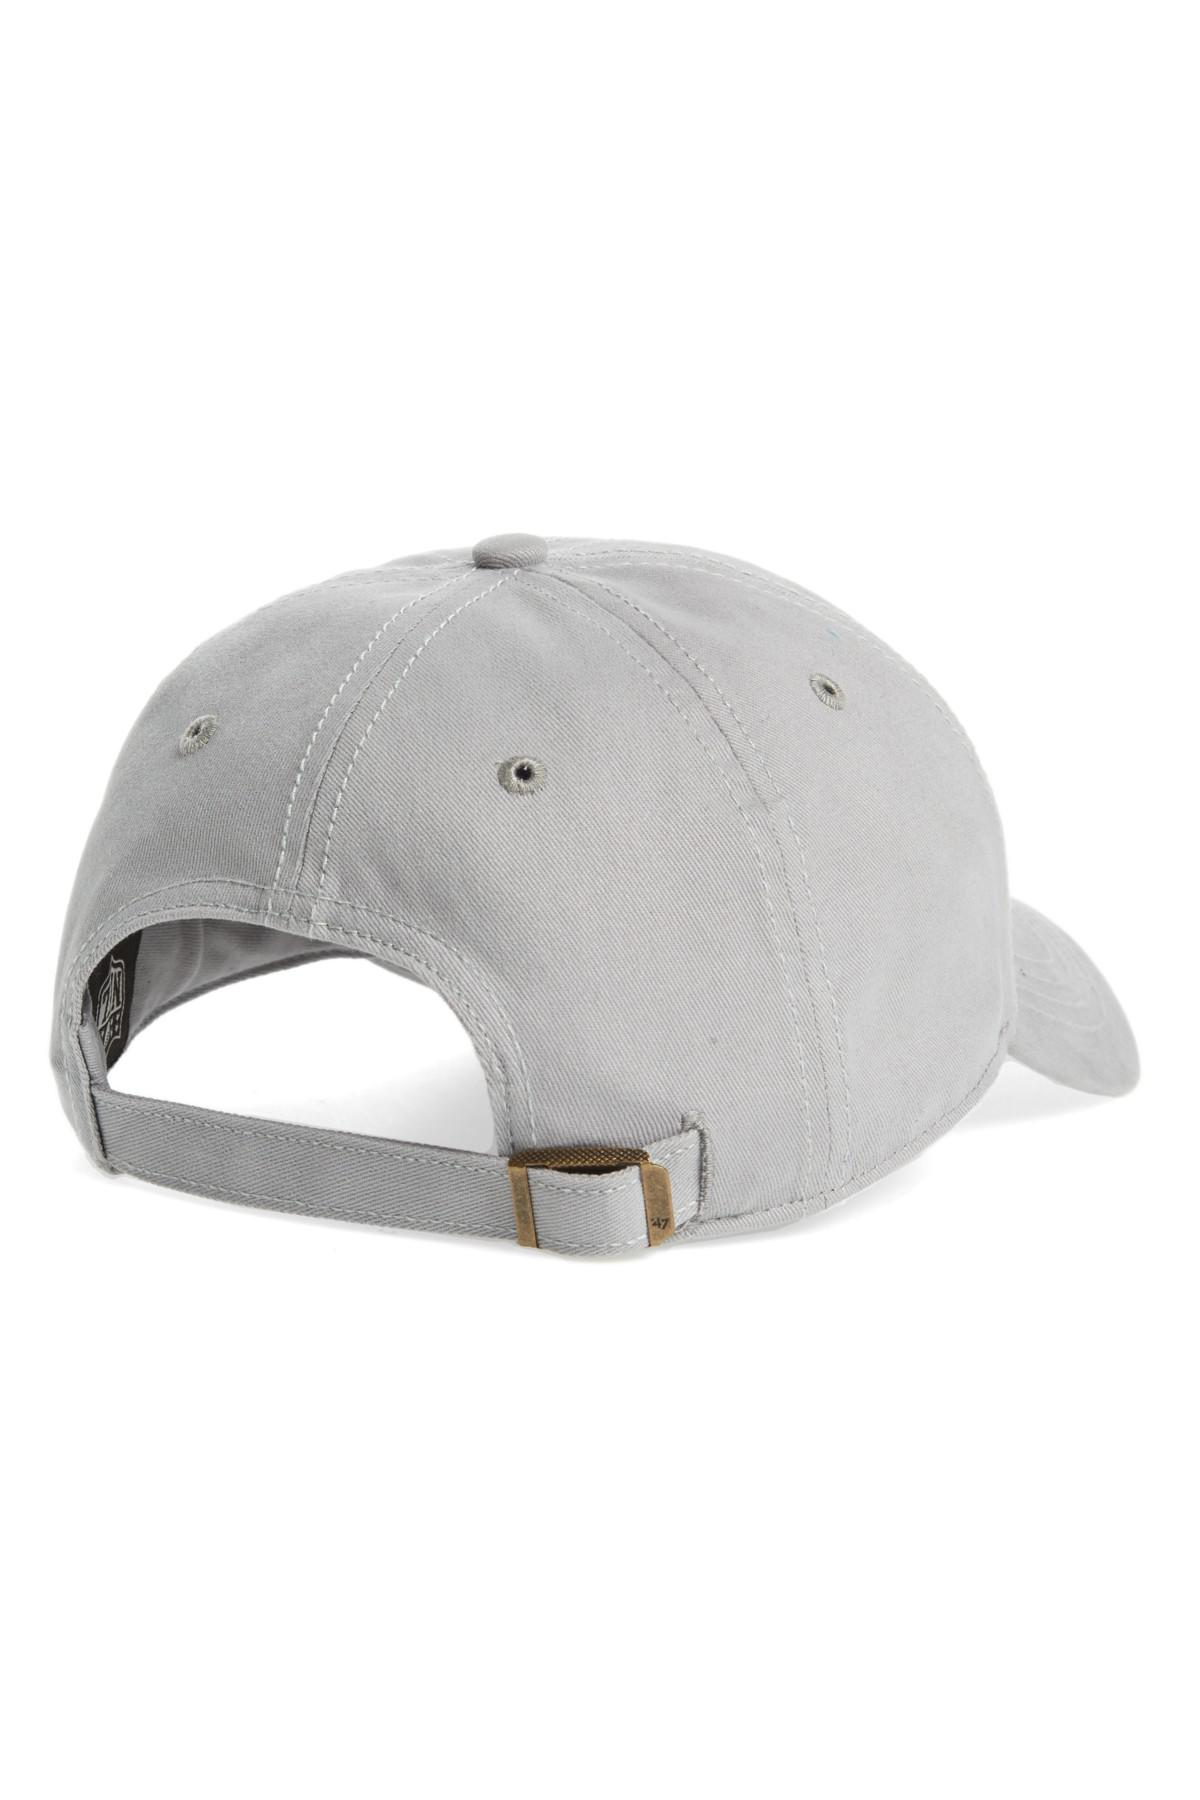 06f9422129381 47 Brand Miata Oakland Raiders Baseball Cap in Gray for Men - Lyst